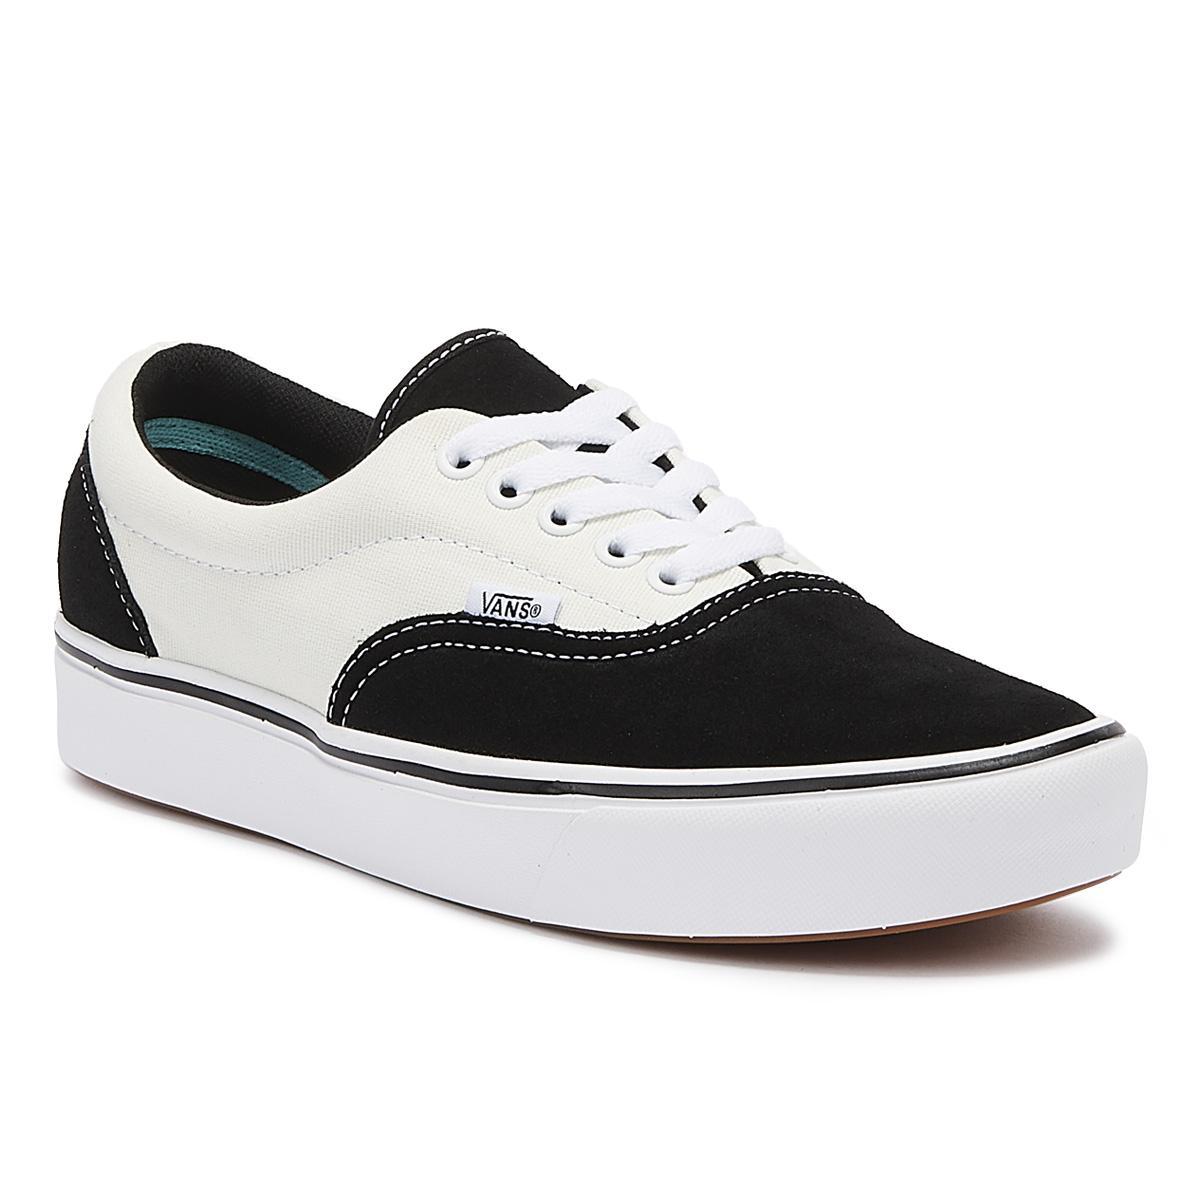 Comfycush Era Mens Black / Marshmallow Sneakers